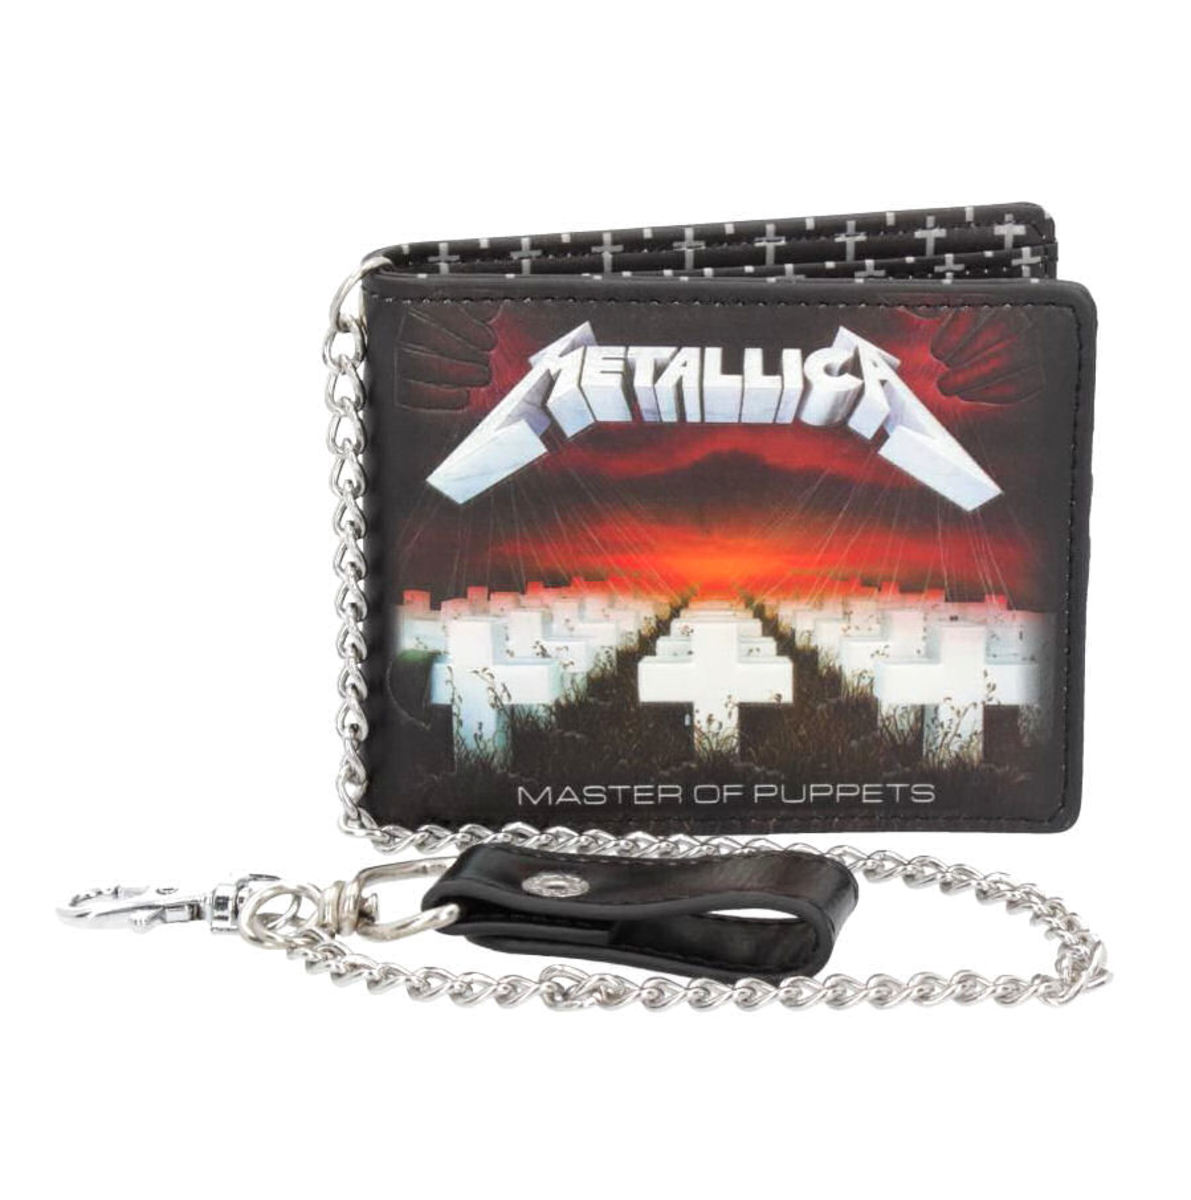 peňaženka Metallica - Master of Puppets - B4684N9